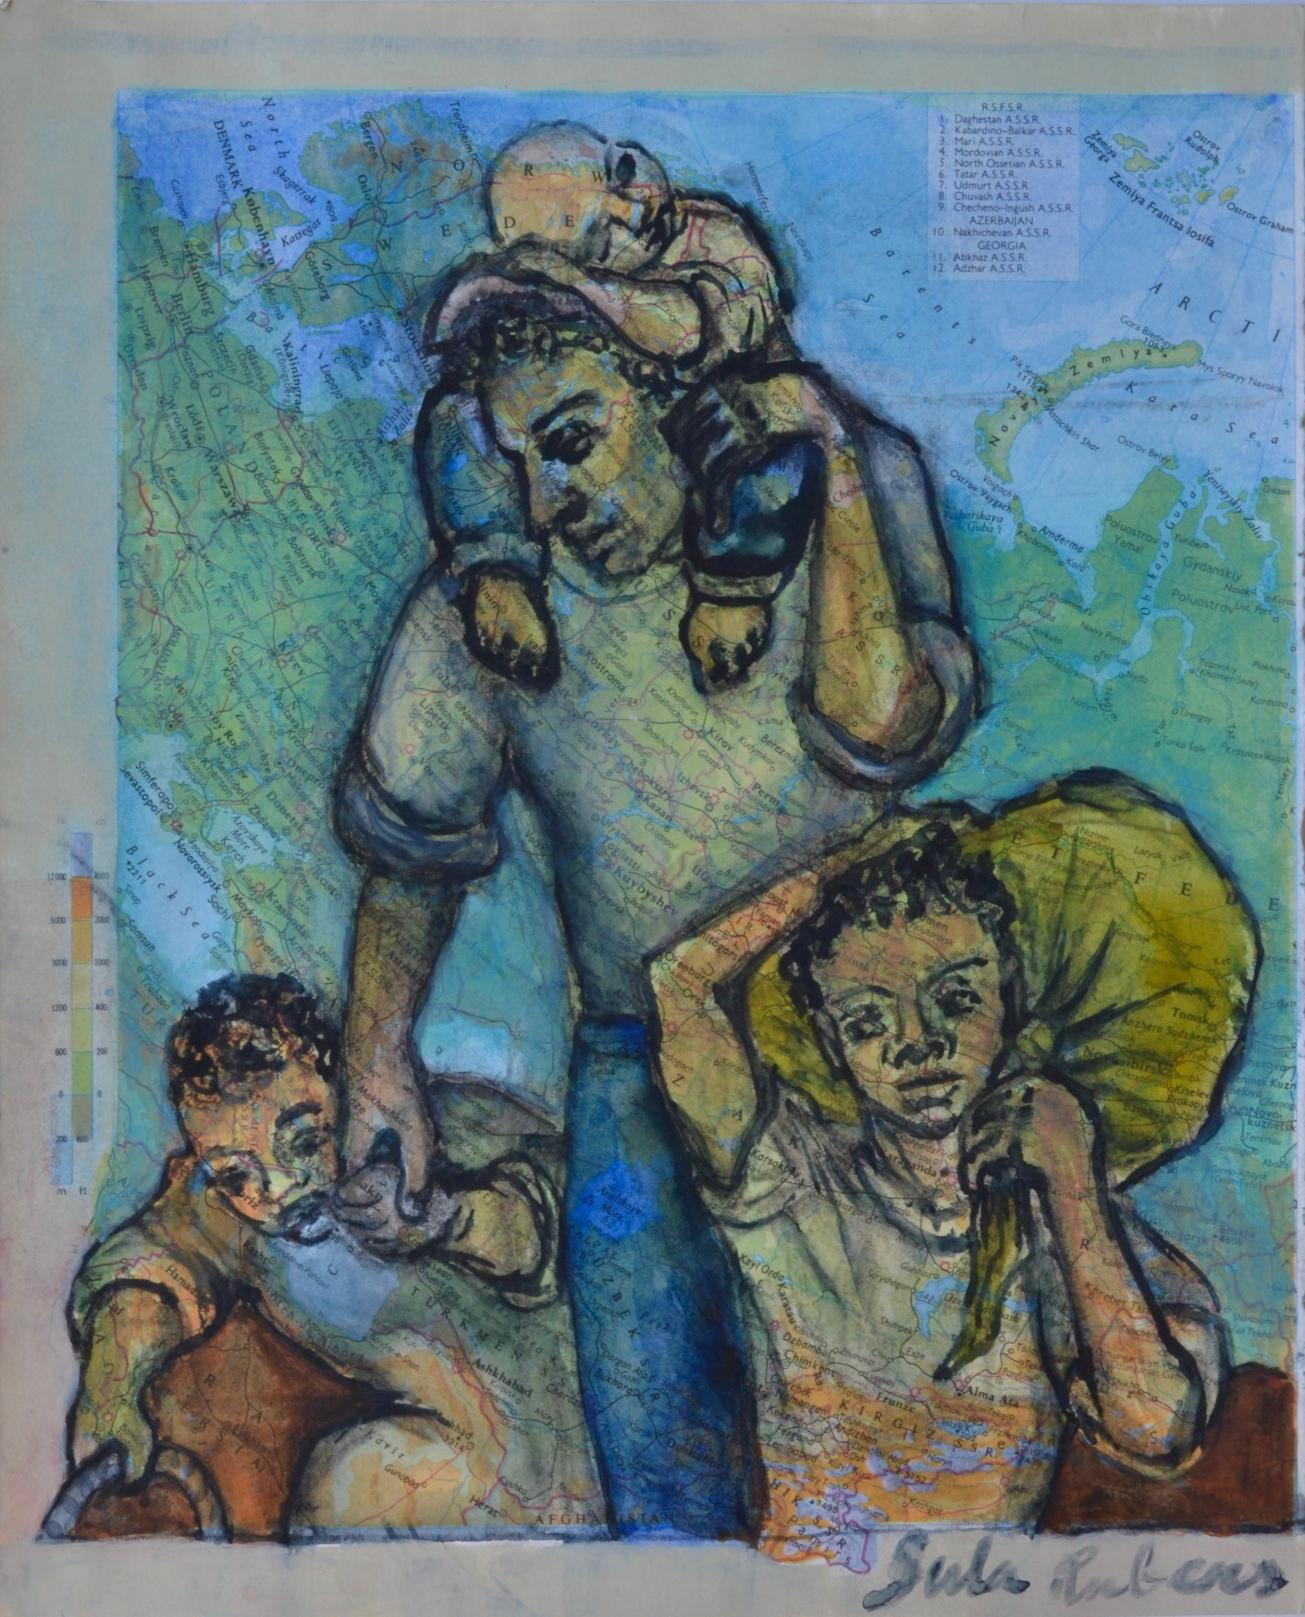 Kin Study - Family Watercolour on paper 19 x 24 cm